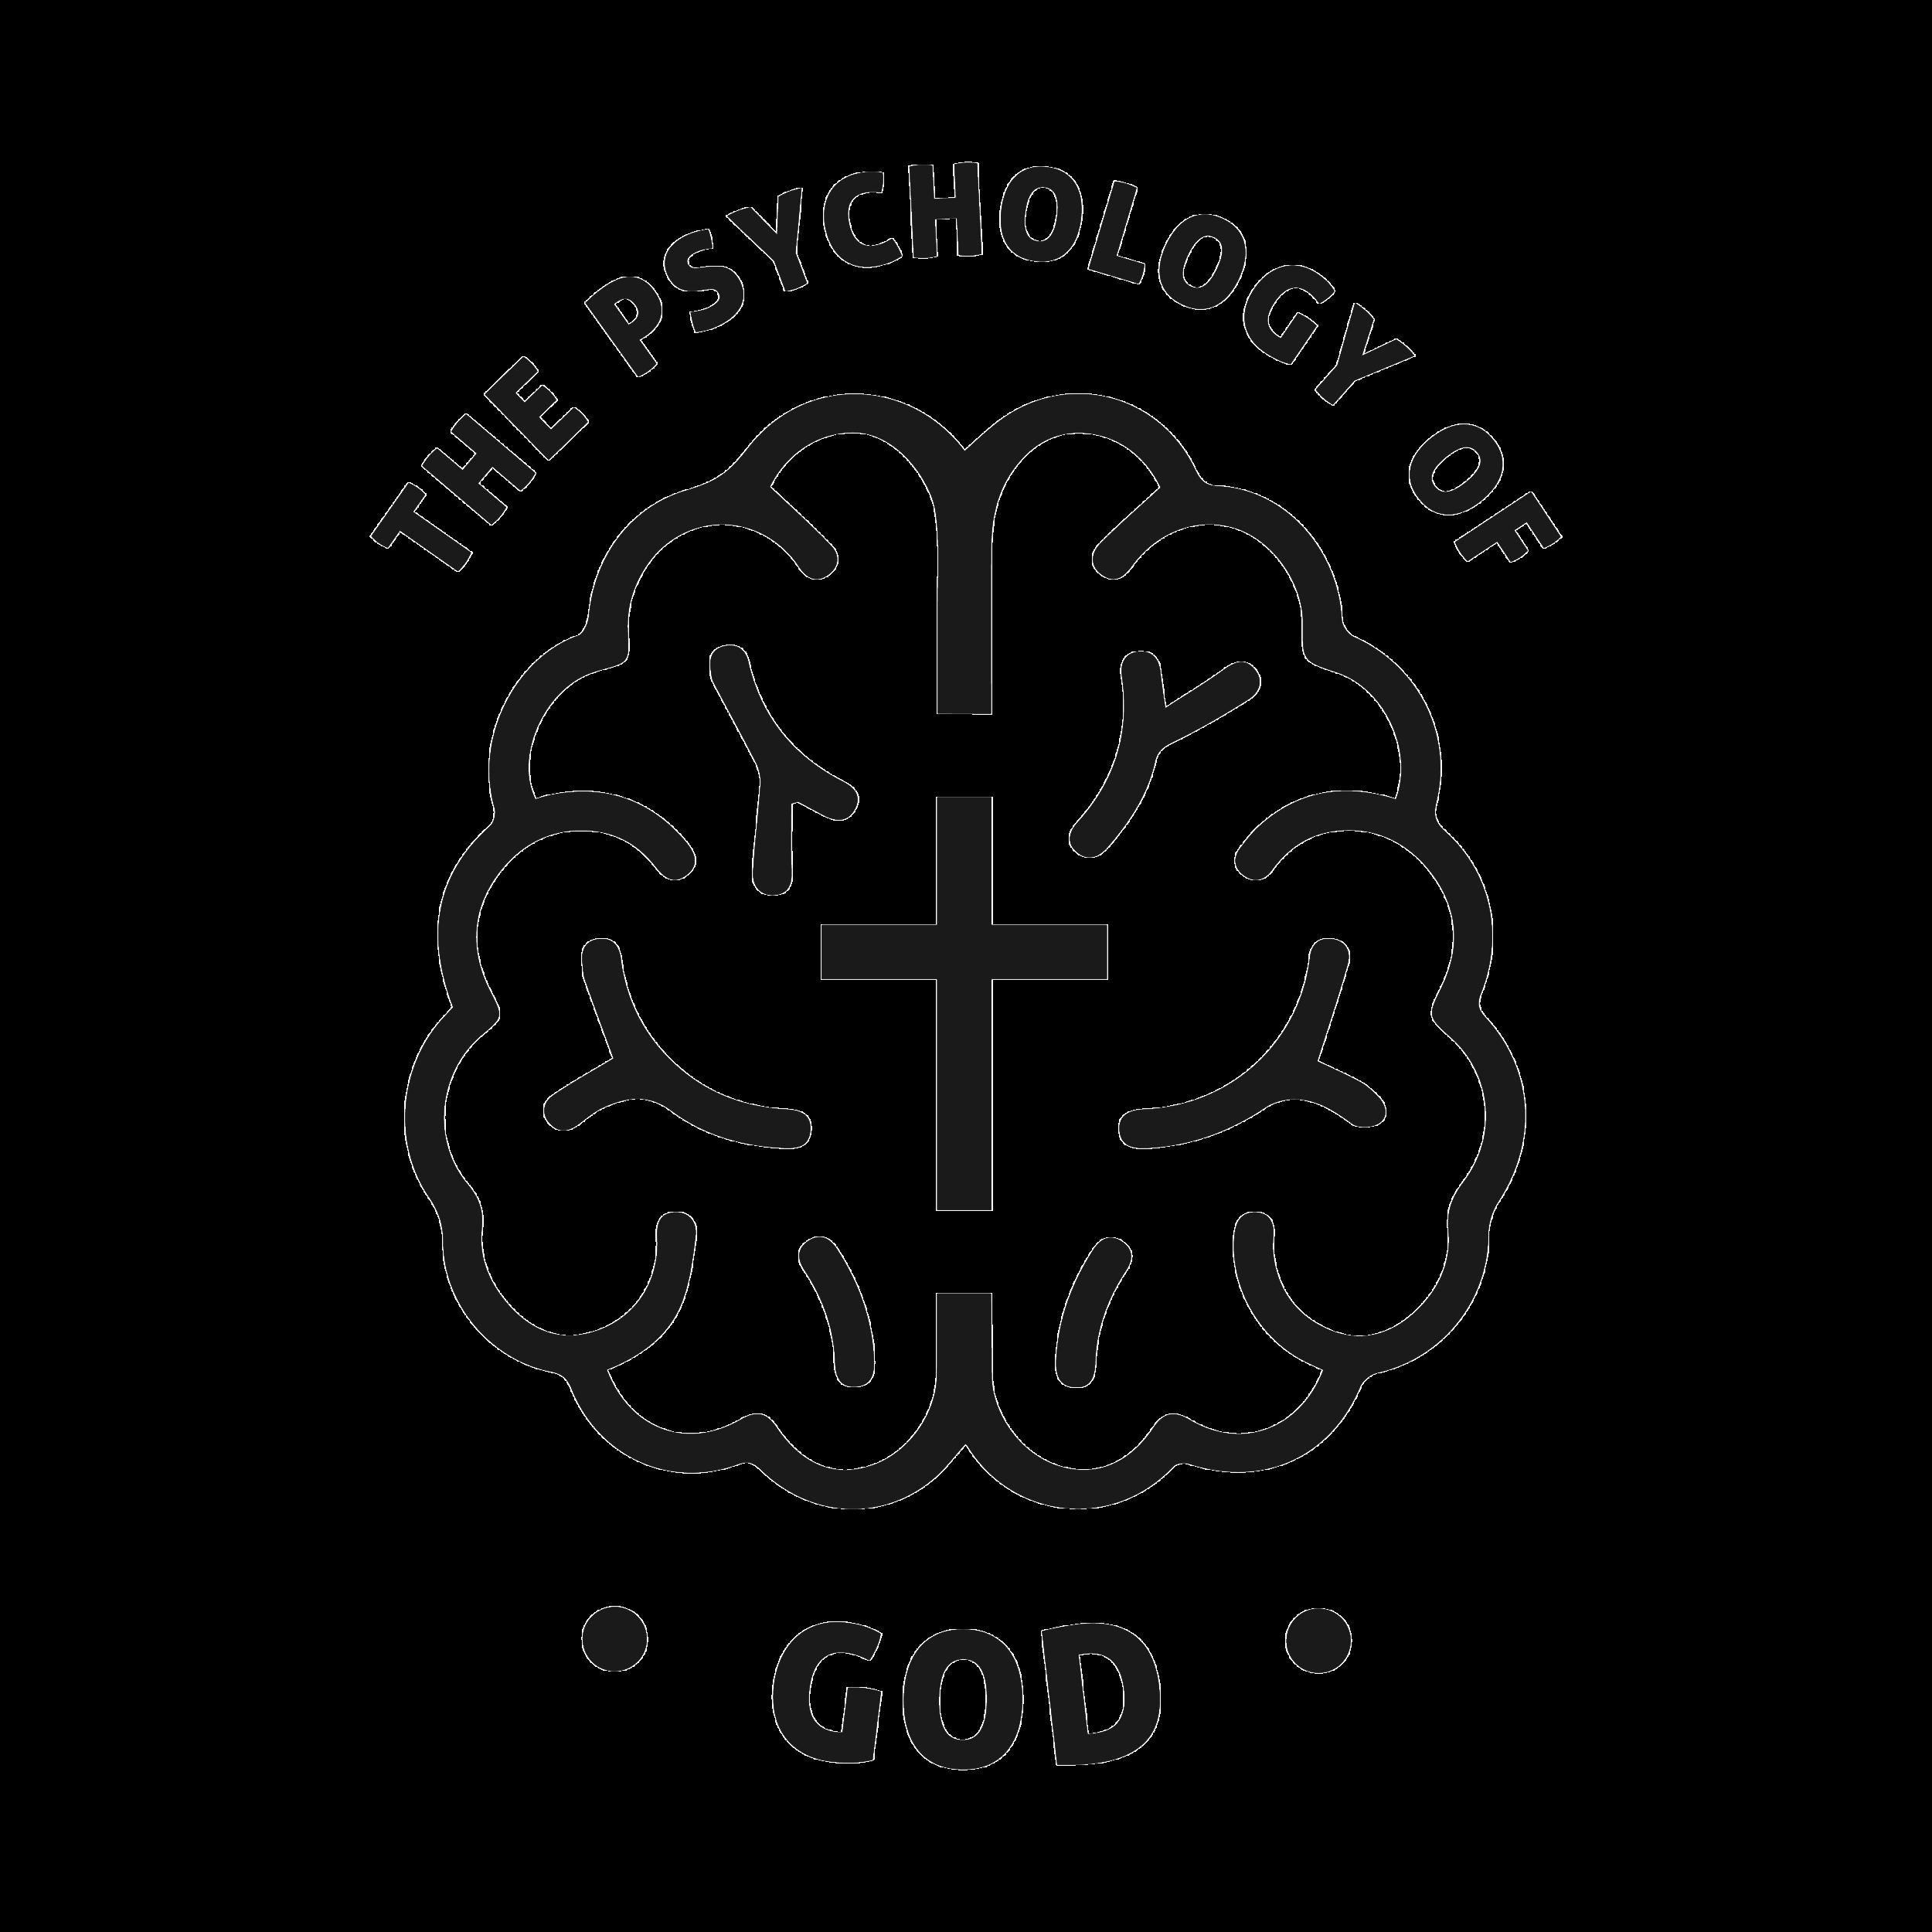 the-psychology-of-god-3000x3000-B.png